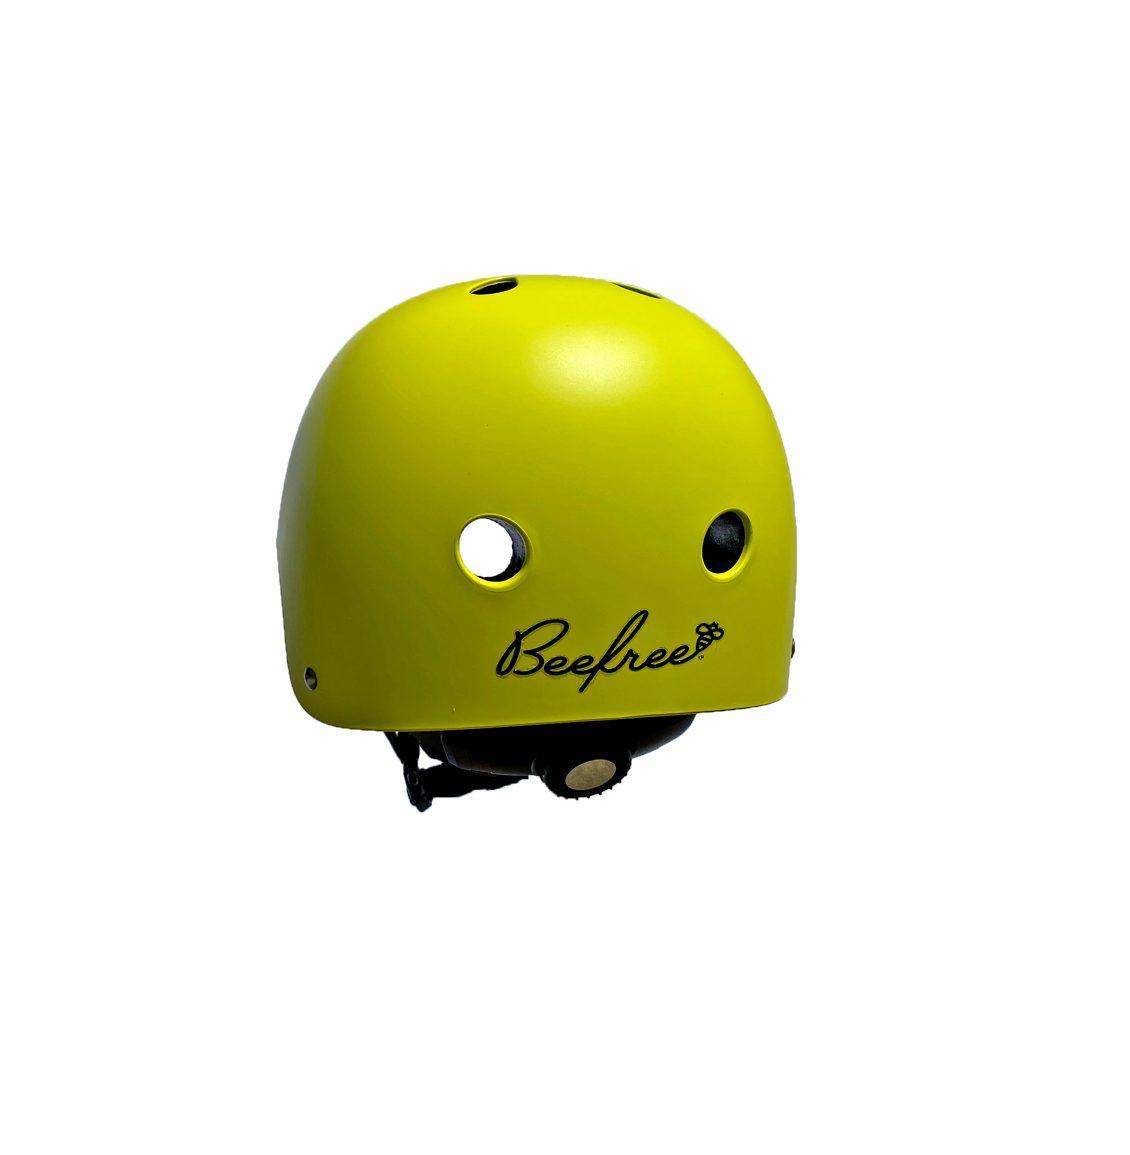 Bee Free Yellow High Visibility Helmet